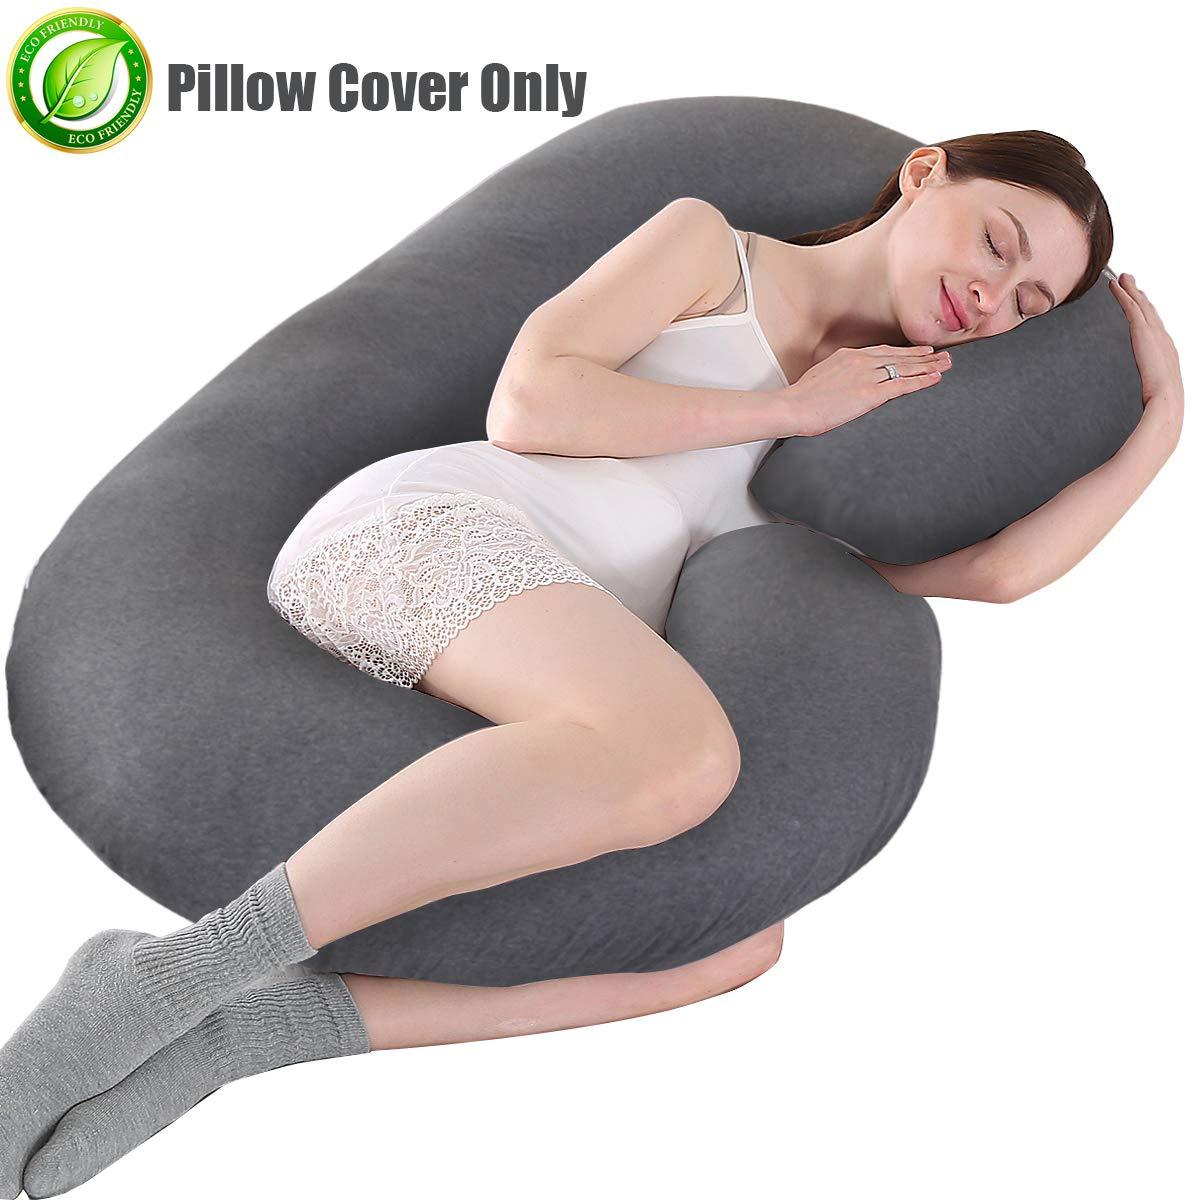 KWLET Pregnancy Pillow Cover C Shaped Pregnancy Pillow Case Soft 100/% Jersey Cotton Pregnancy Pillow Cover Maternity Pillow Case Pillowcase with Double Zipper Replacement Pregnancy Pillowcase Grey